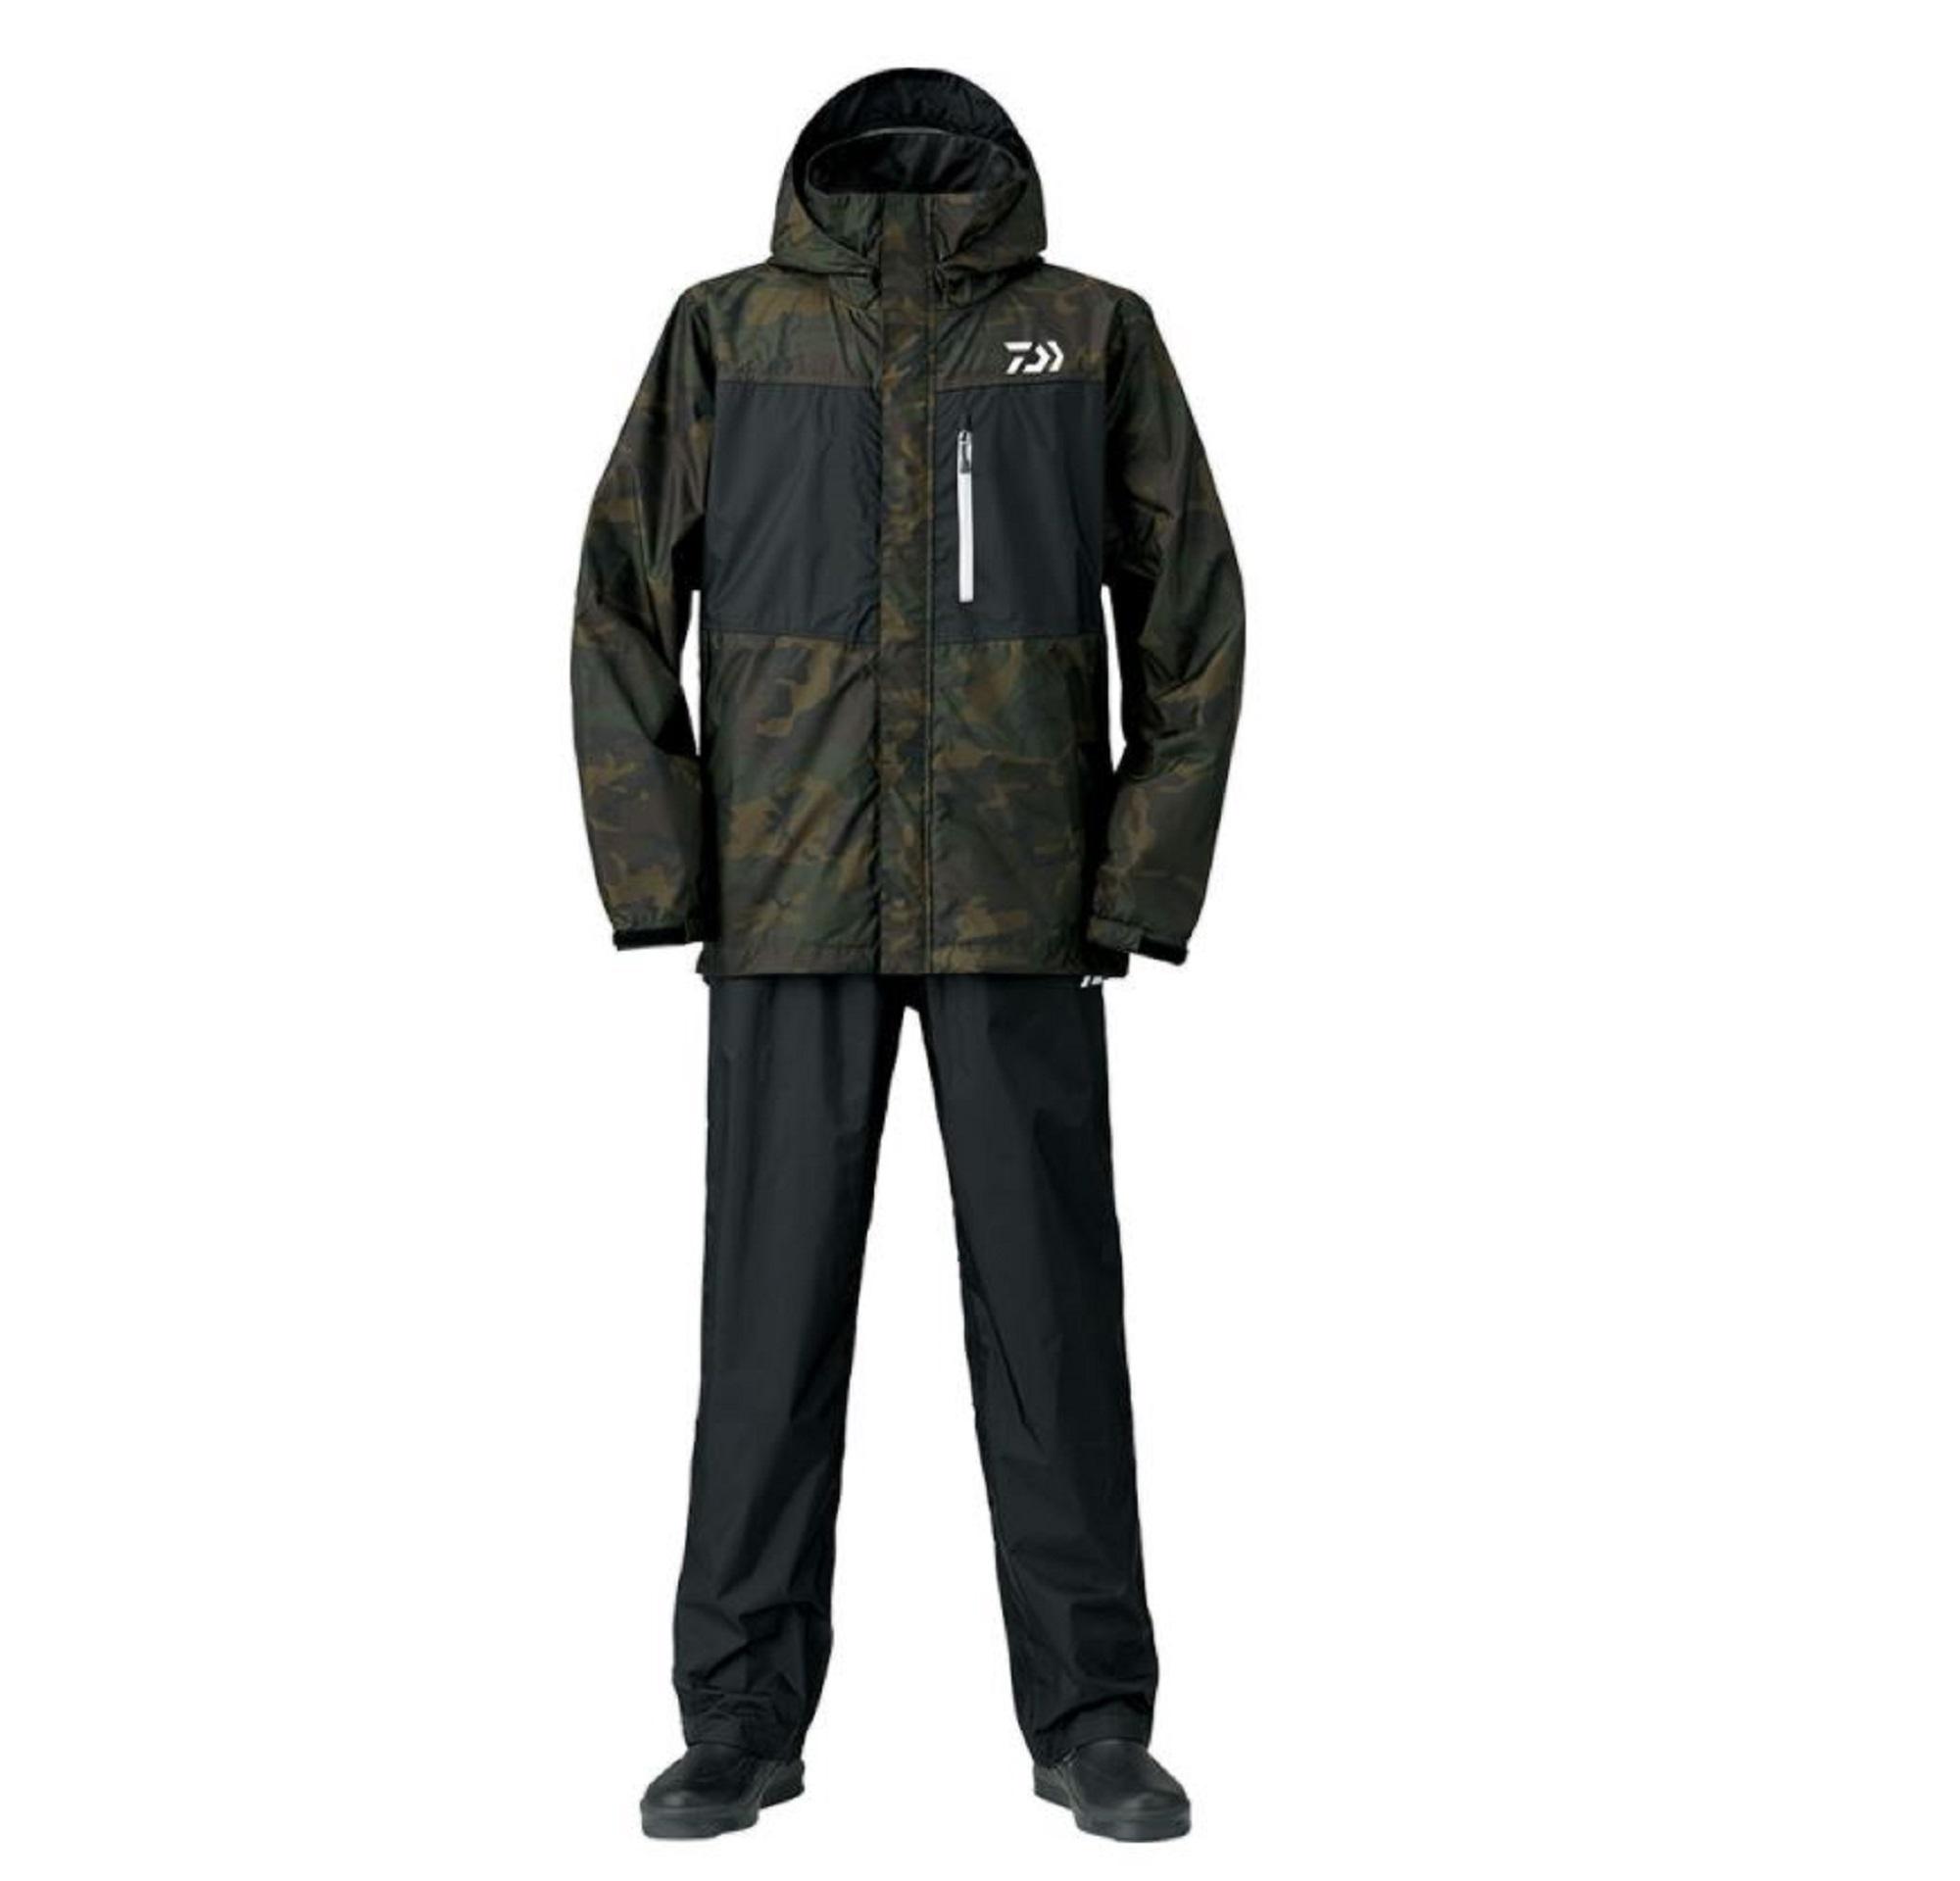 Daiwa DR-3621 Rainmax Water Repellent Jacket Size M Green Camo (6213)